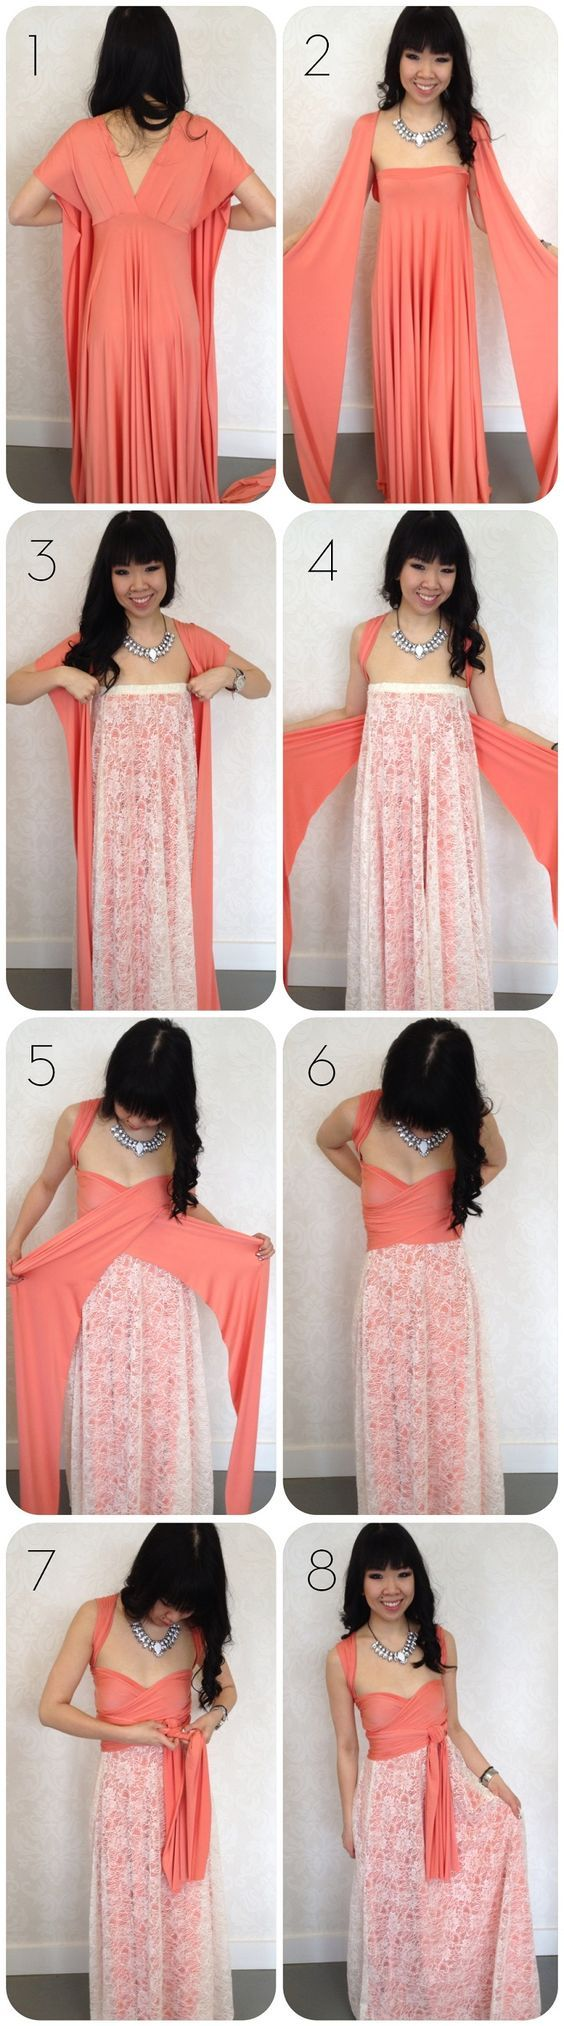 Multi-Wear Wrap - Lie two by VIDA VIDA Y9j7SlMz